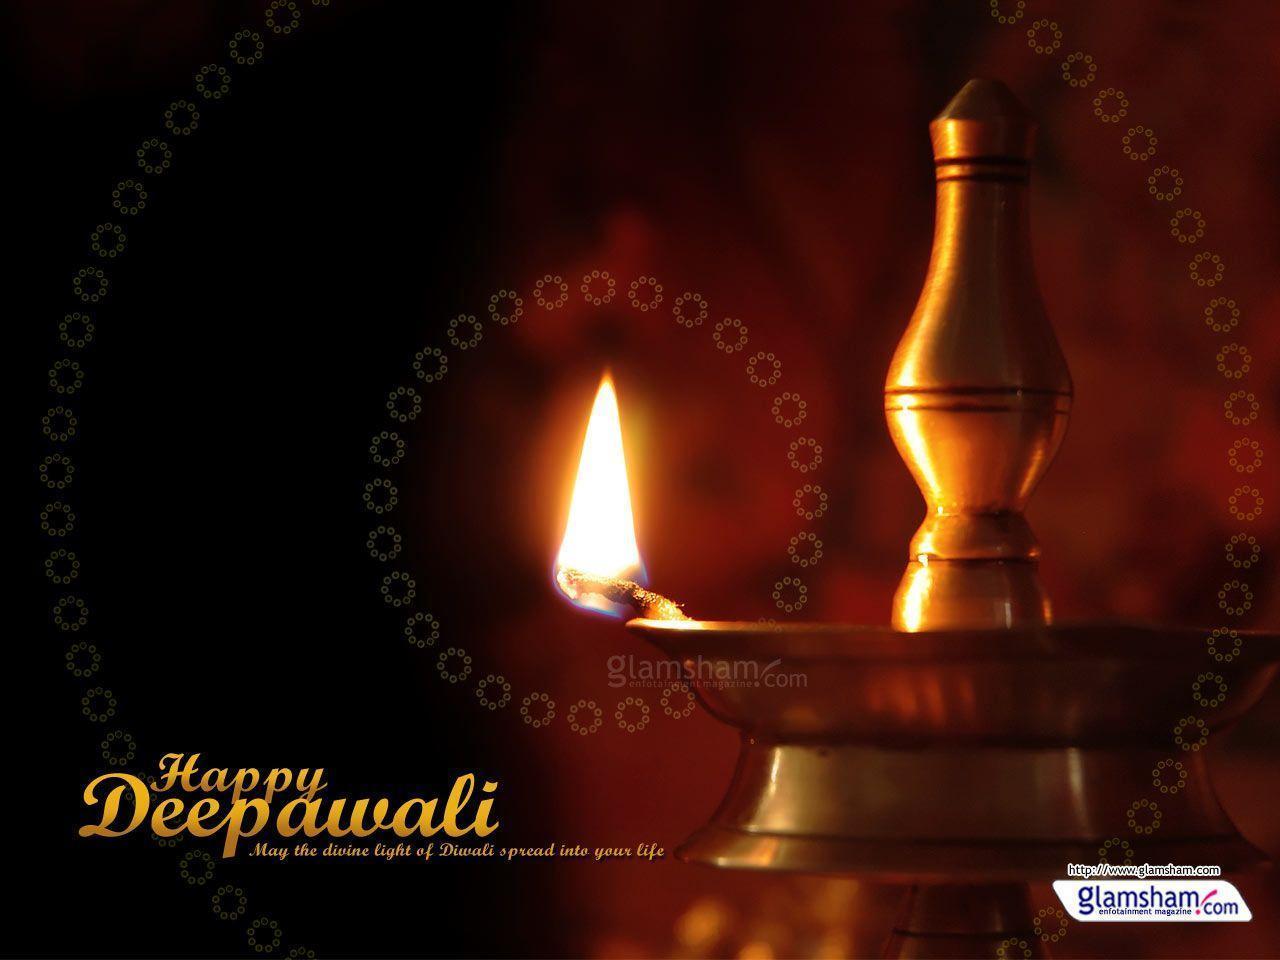 Diwali HD wallpaper 36187 - Glamsham